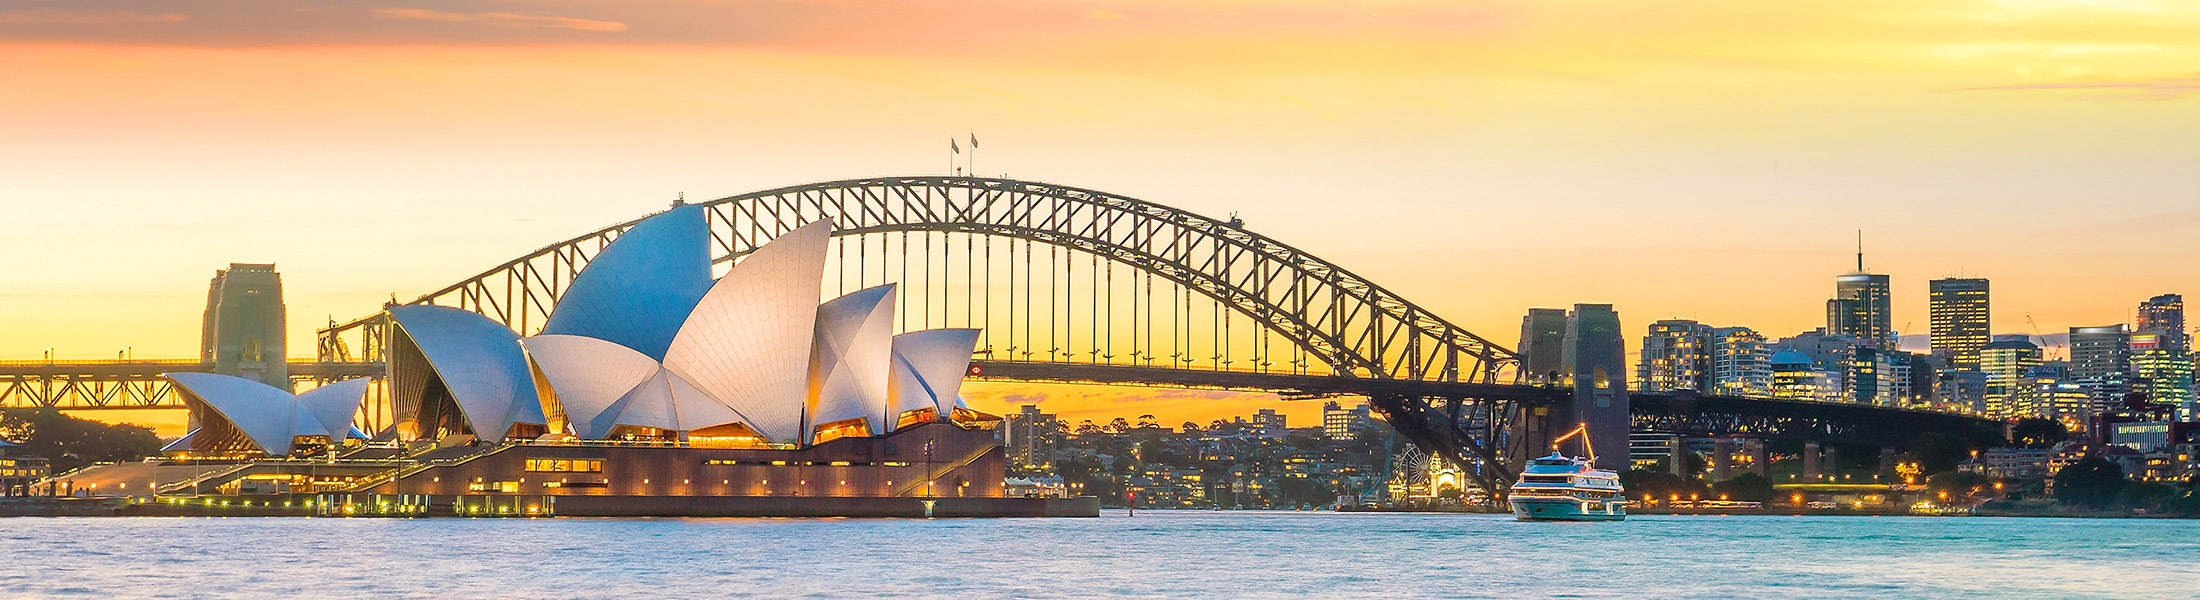 Sydney Harbour Bridge & Sydney Opera House